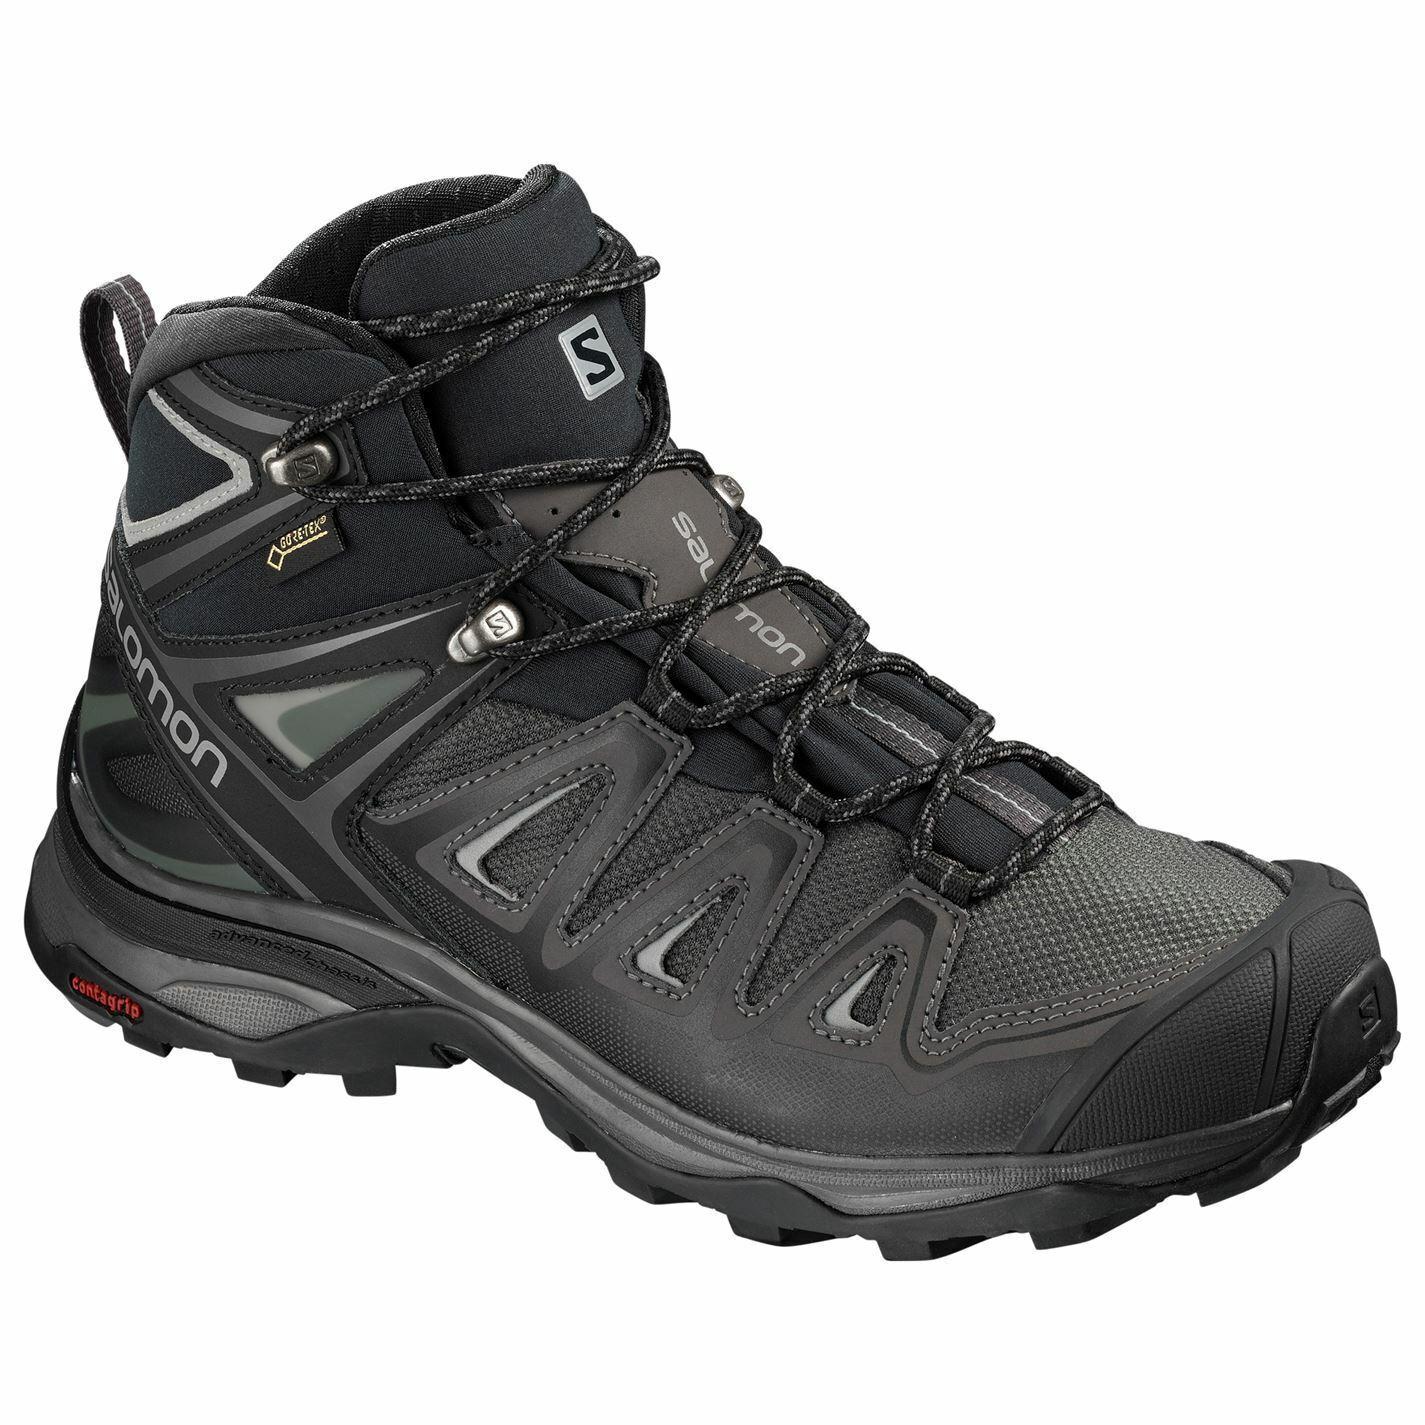 Salomon  X Ultra Medio Gtx Para mujeres Zapatos para Caminar 3 gris Negro botas Senderismo Trekking  nueva marca